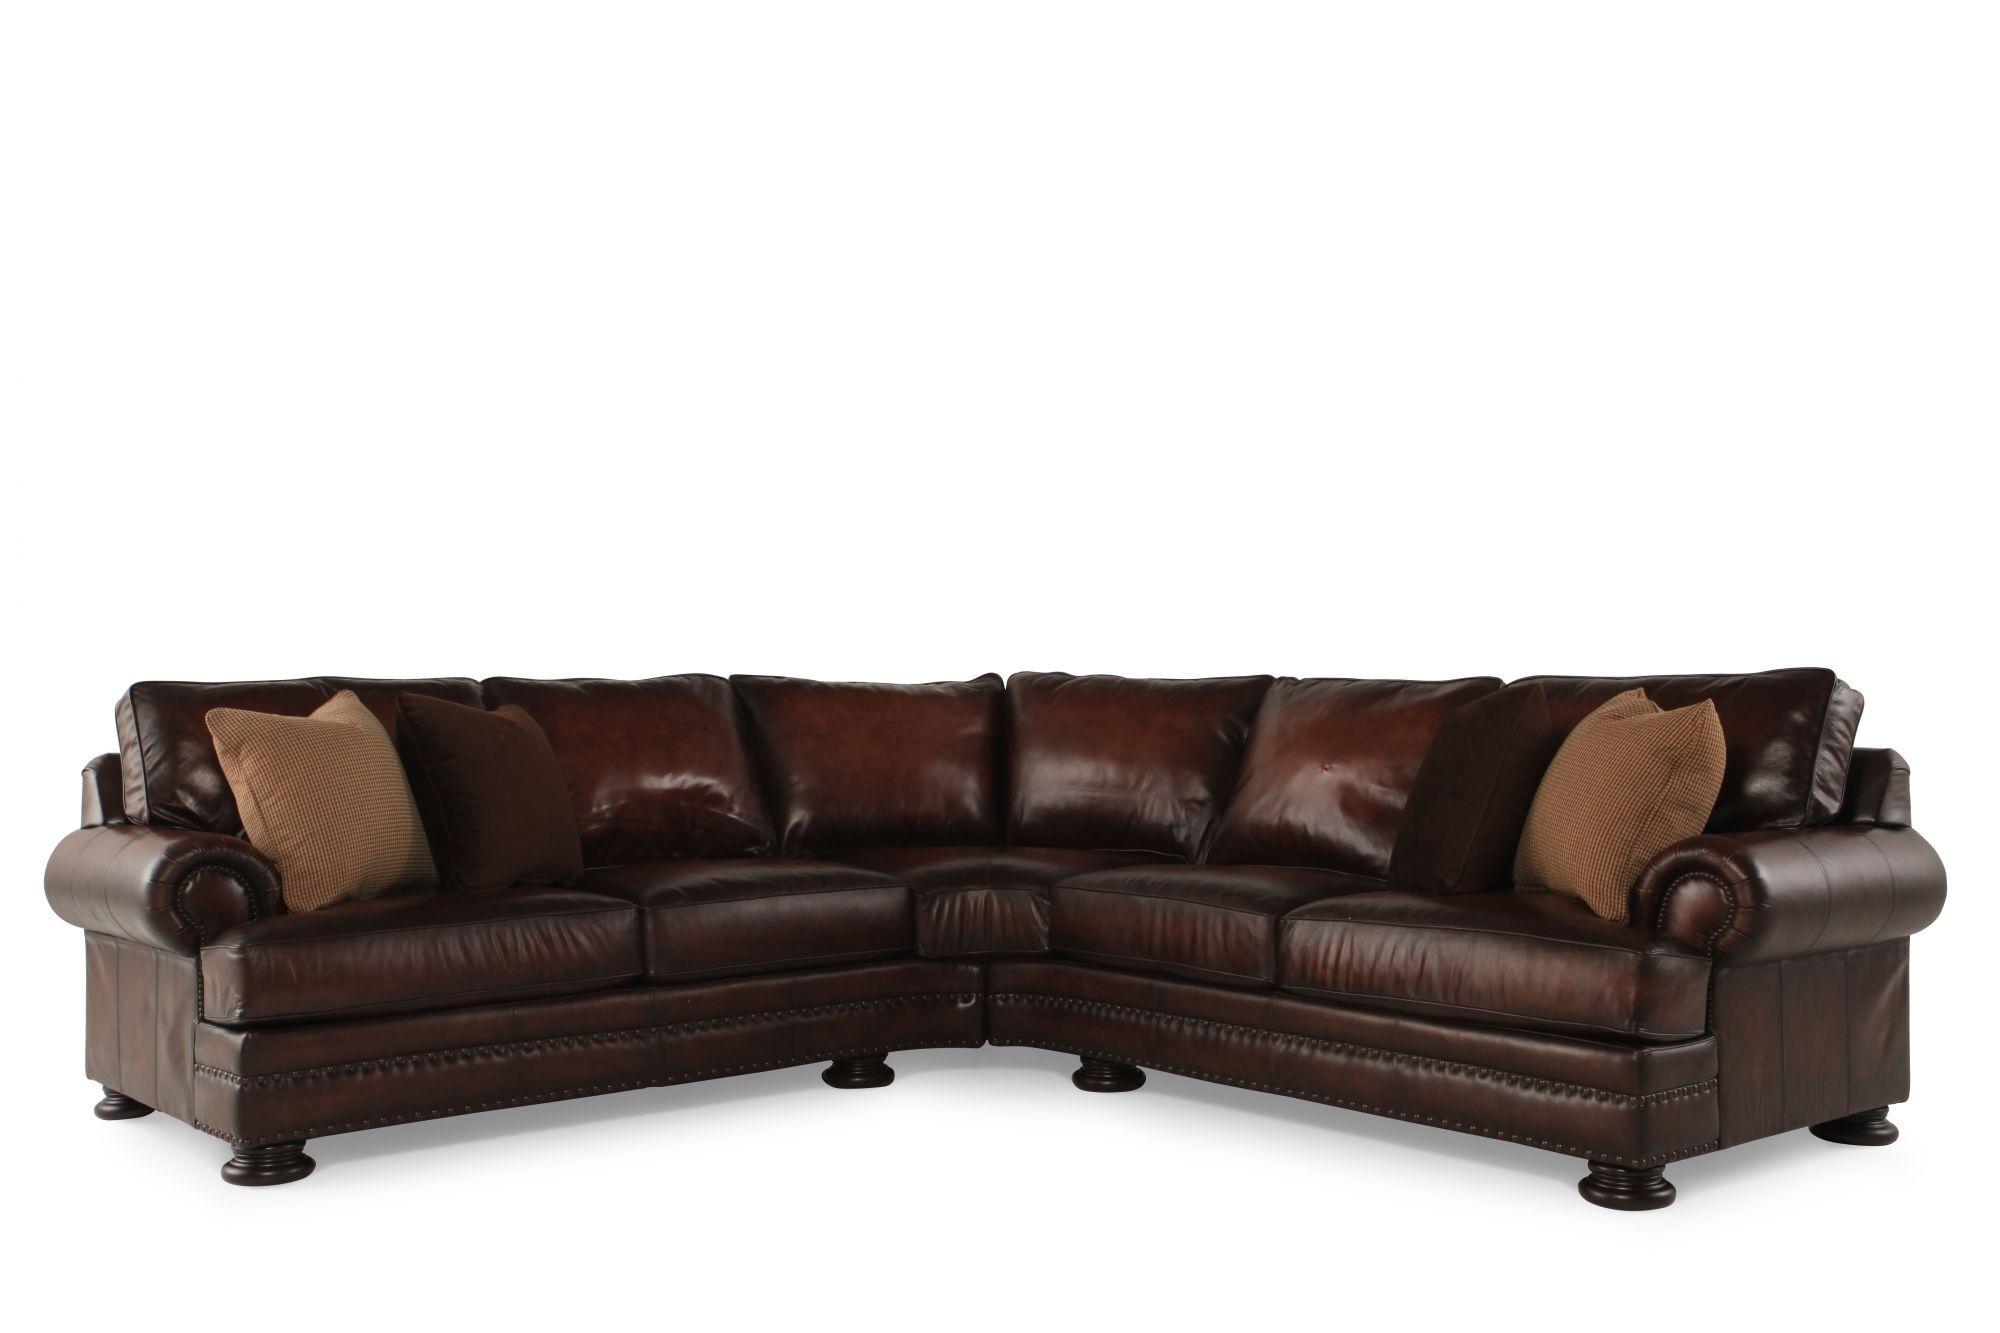 European Classic Nailhead Accented Leather 103u0026quot; ...